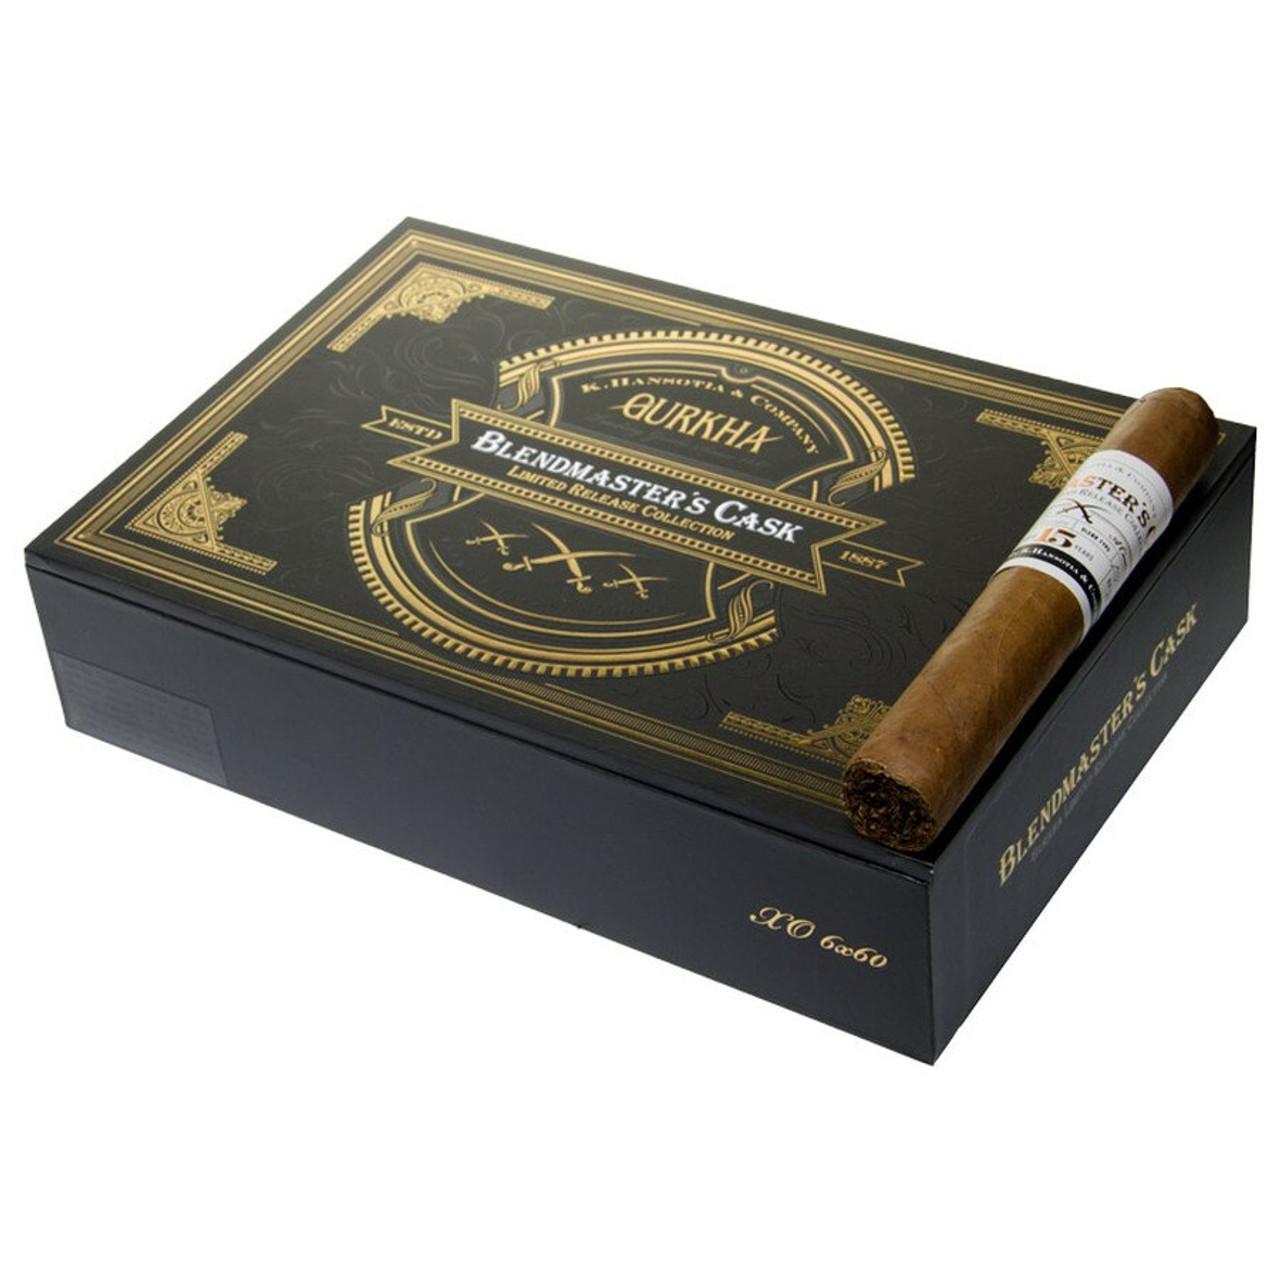 Gurkha Blendmaster's Cask Ambassador Cigars - 7.0 x 55 (Box of 20)